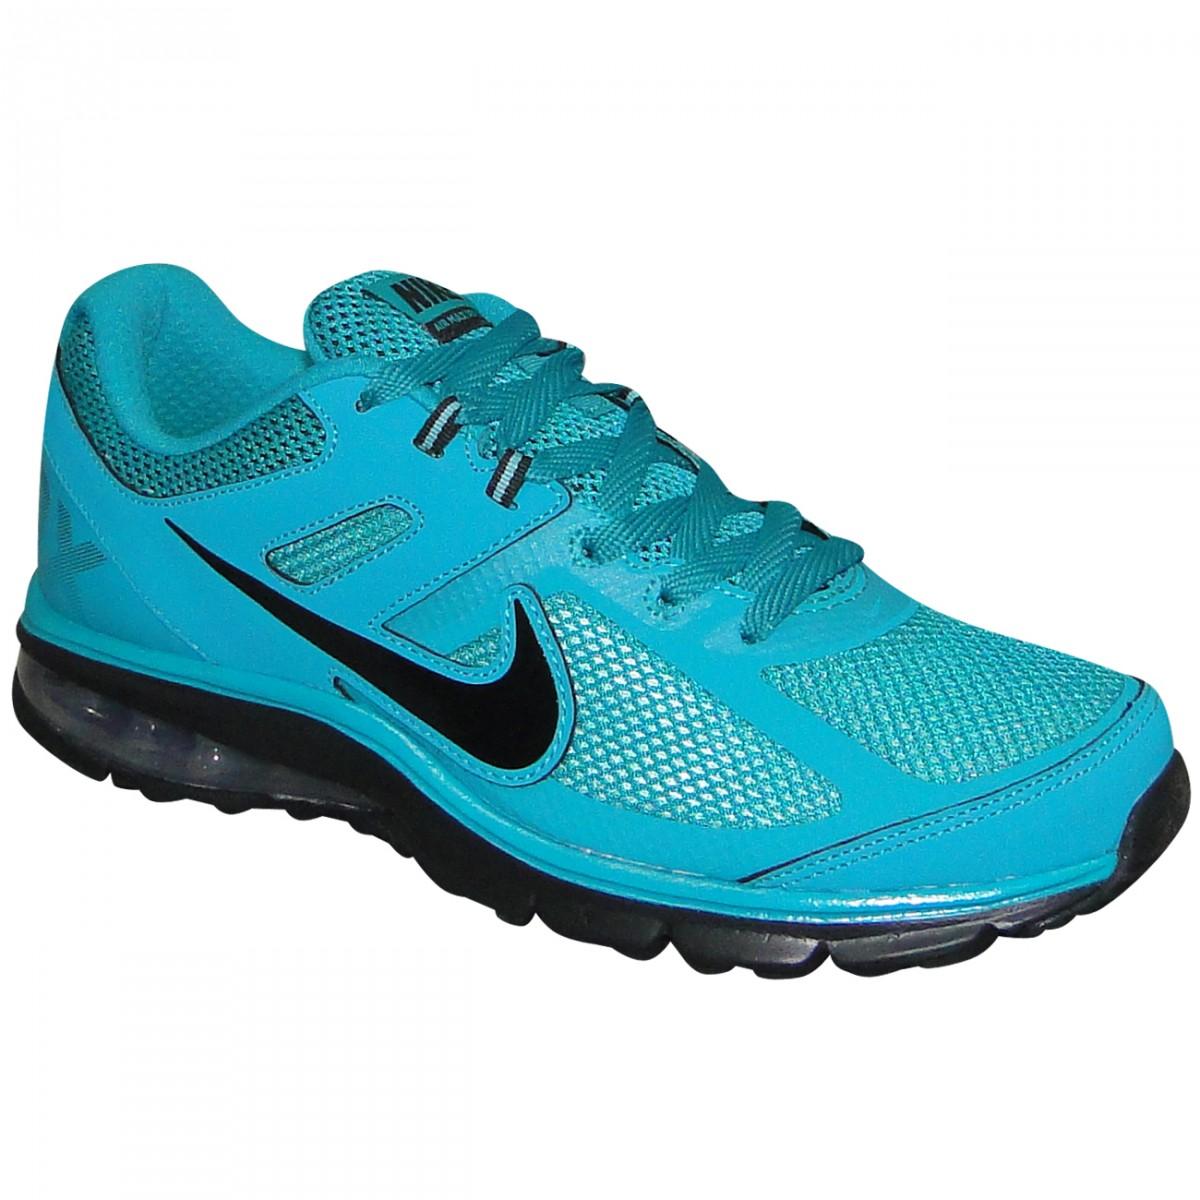 free shipping 05f8a 54937 ... Tenis Nike Air Max Defy Rn. ZOOM